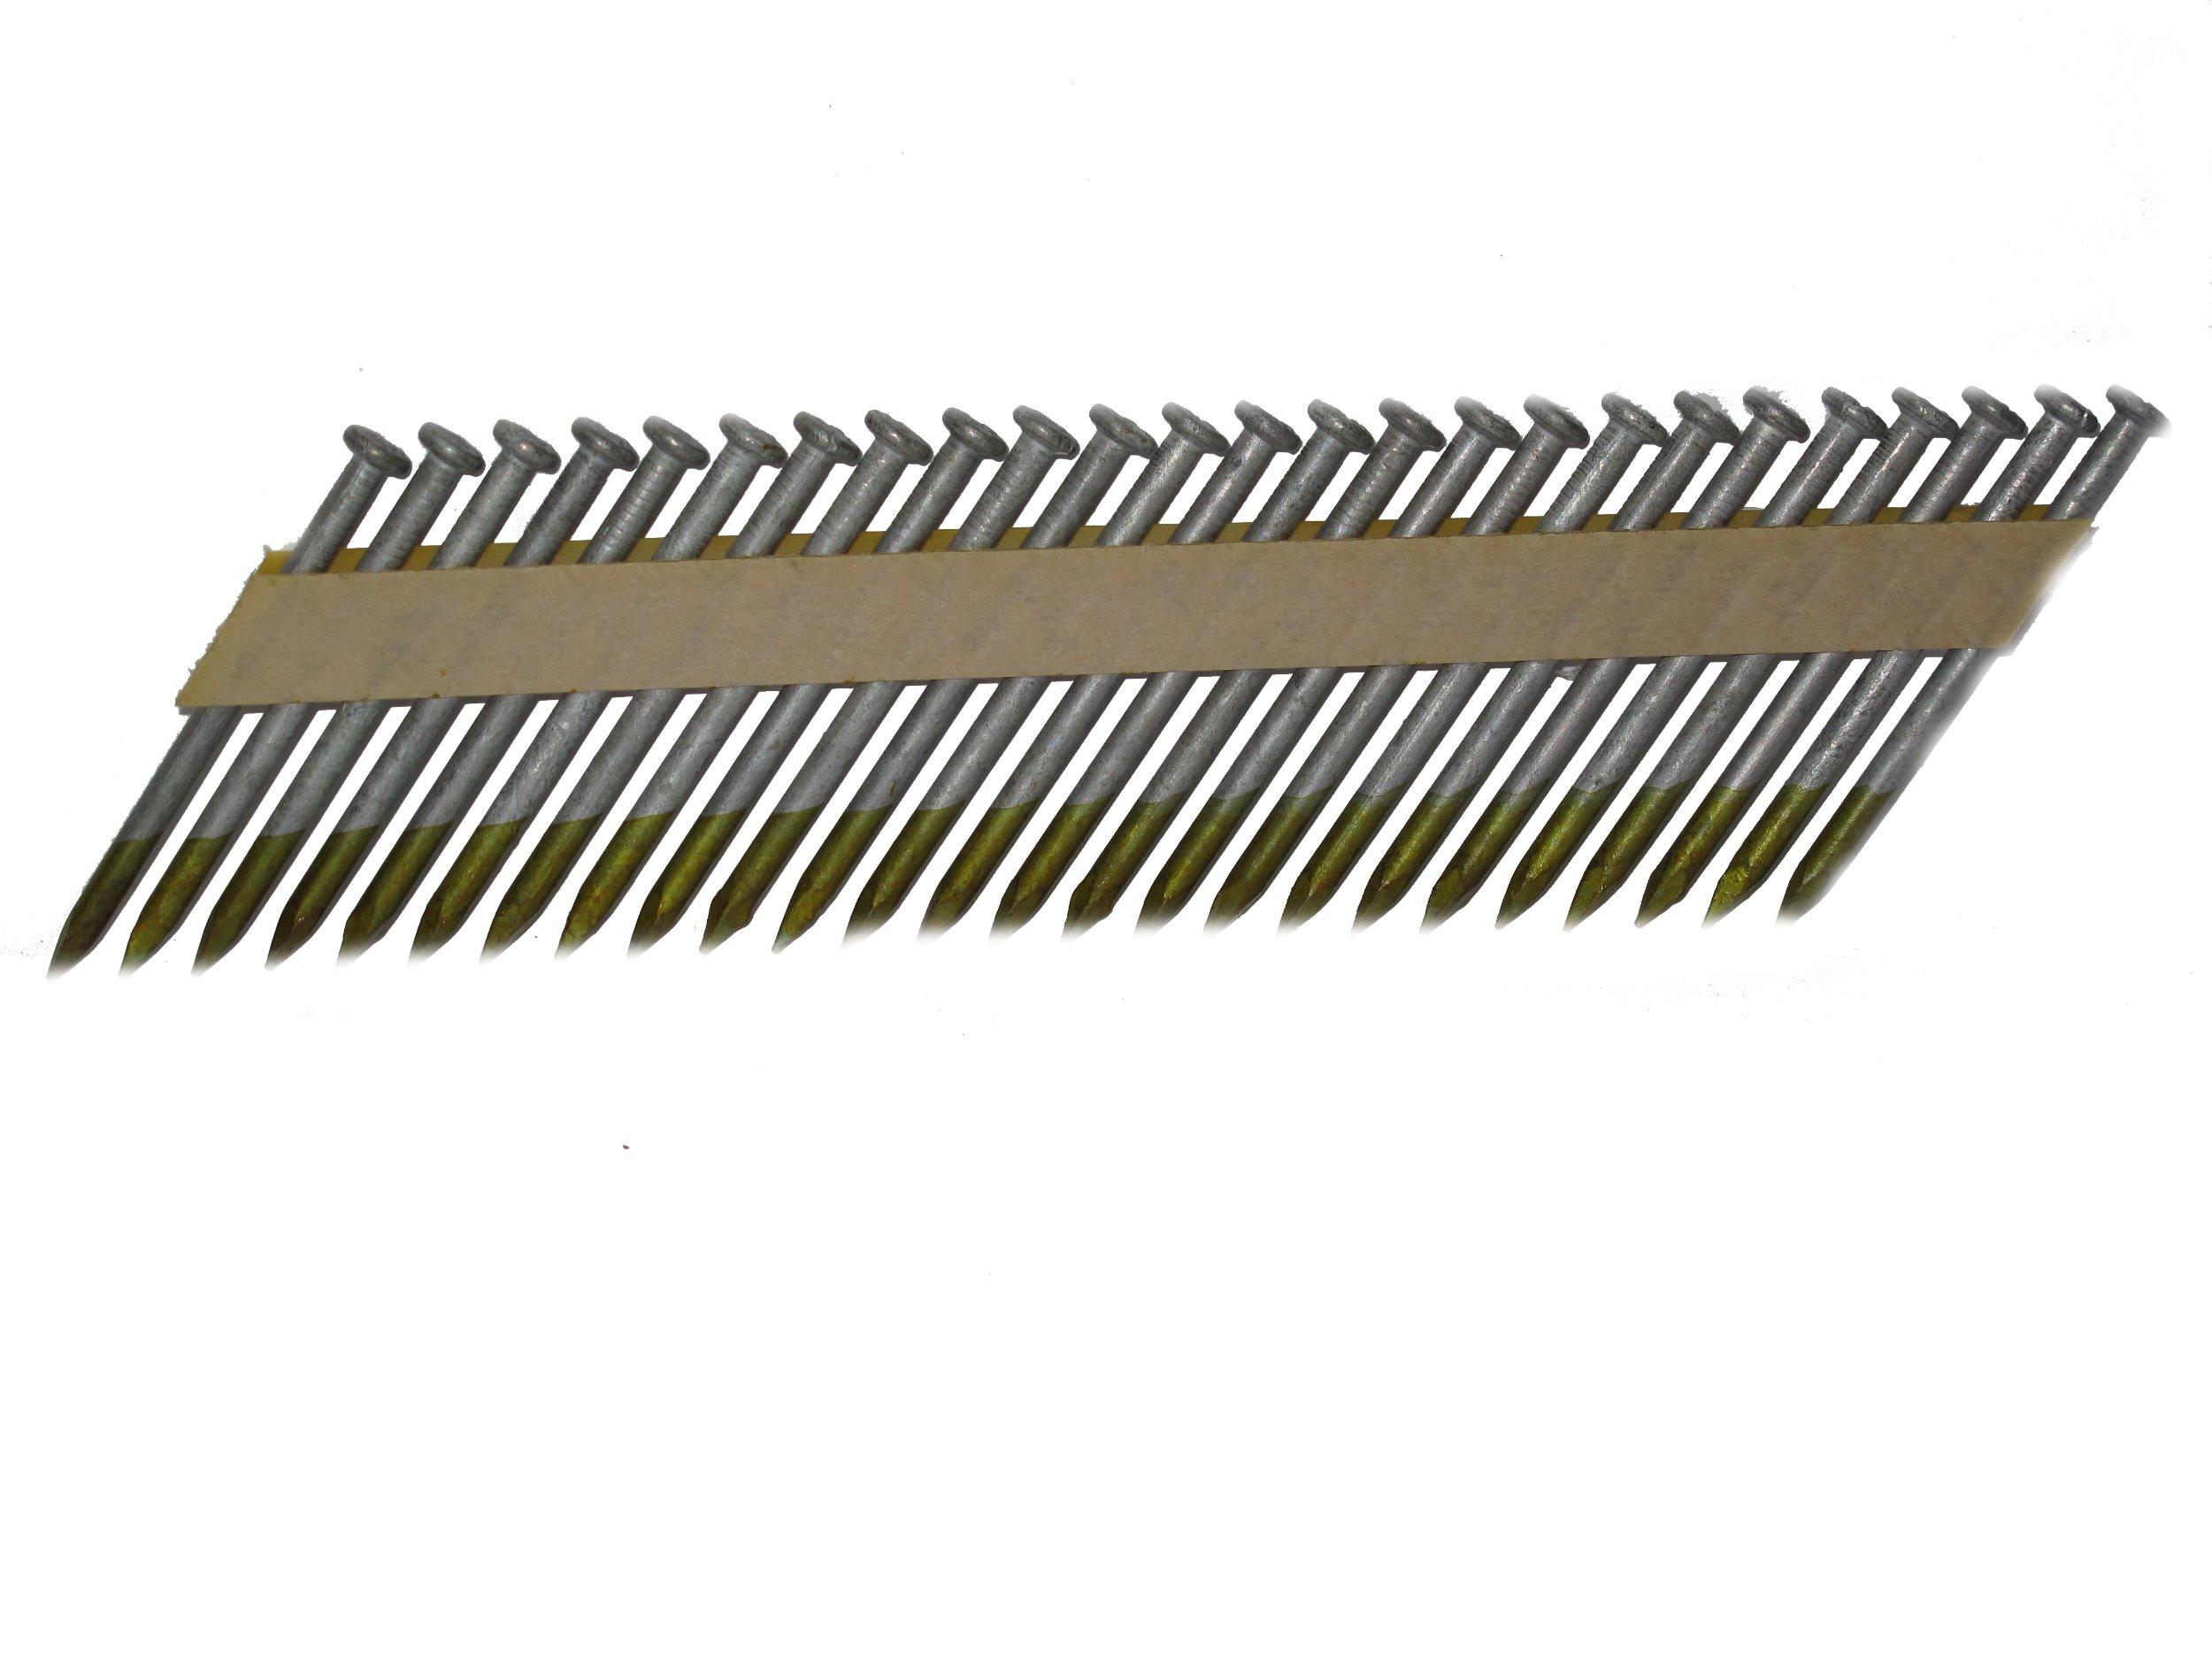 Pneu-Tools 922425 2-1/2-Inch by 0.148 30-33 Degree Hot Dipped Galvenized Joist Hanger Nails 1,500/Box